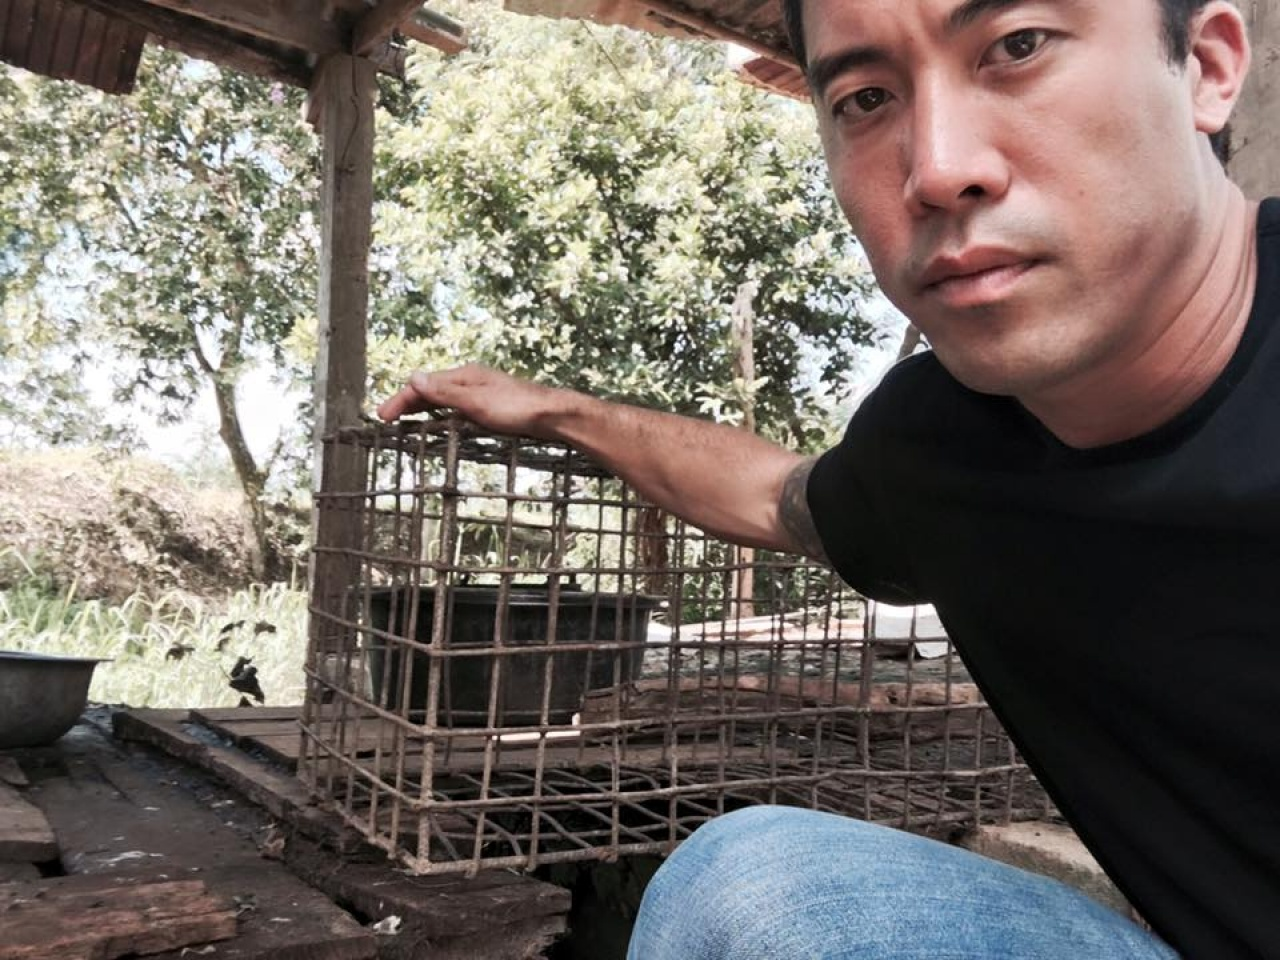 Marc Ching曾上載多張於亞洲拯救狗隻的相片到社交網站。(The Animal Hope & Wellness Foundation FB圖片)